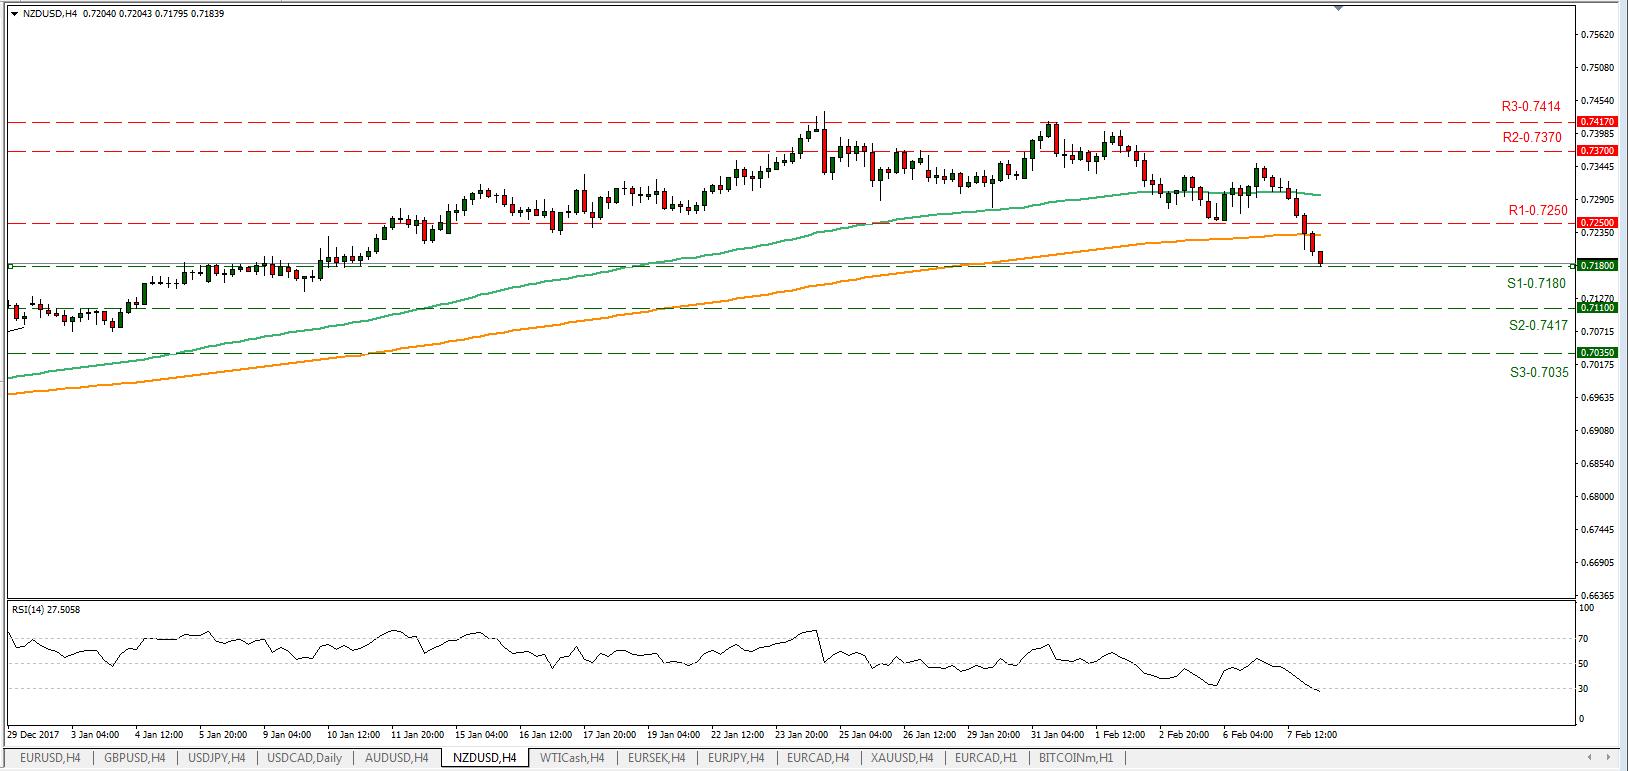 NZD/USD 08/02/2018 | EconAlerts